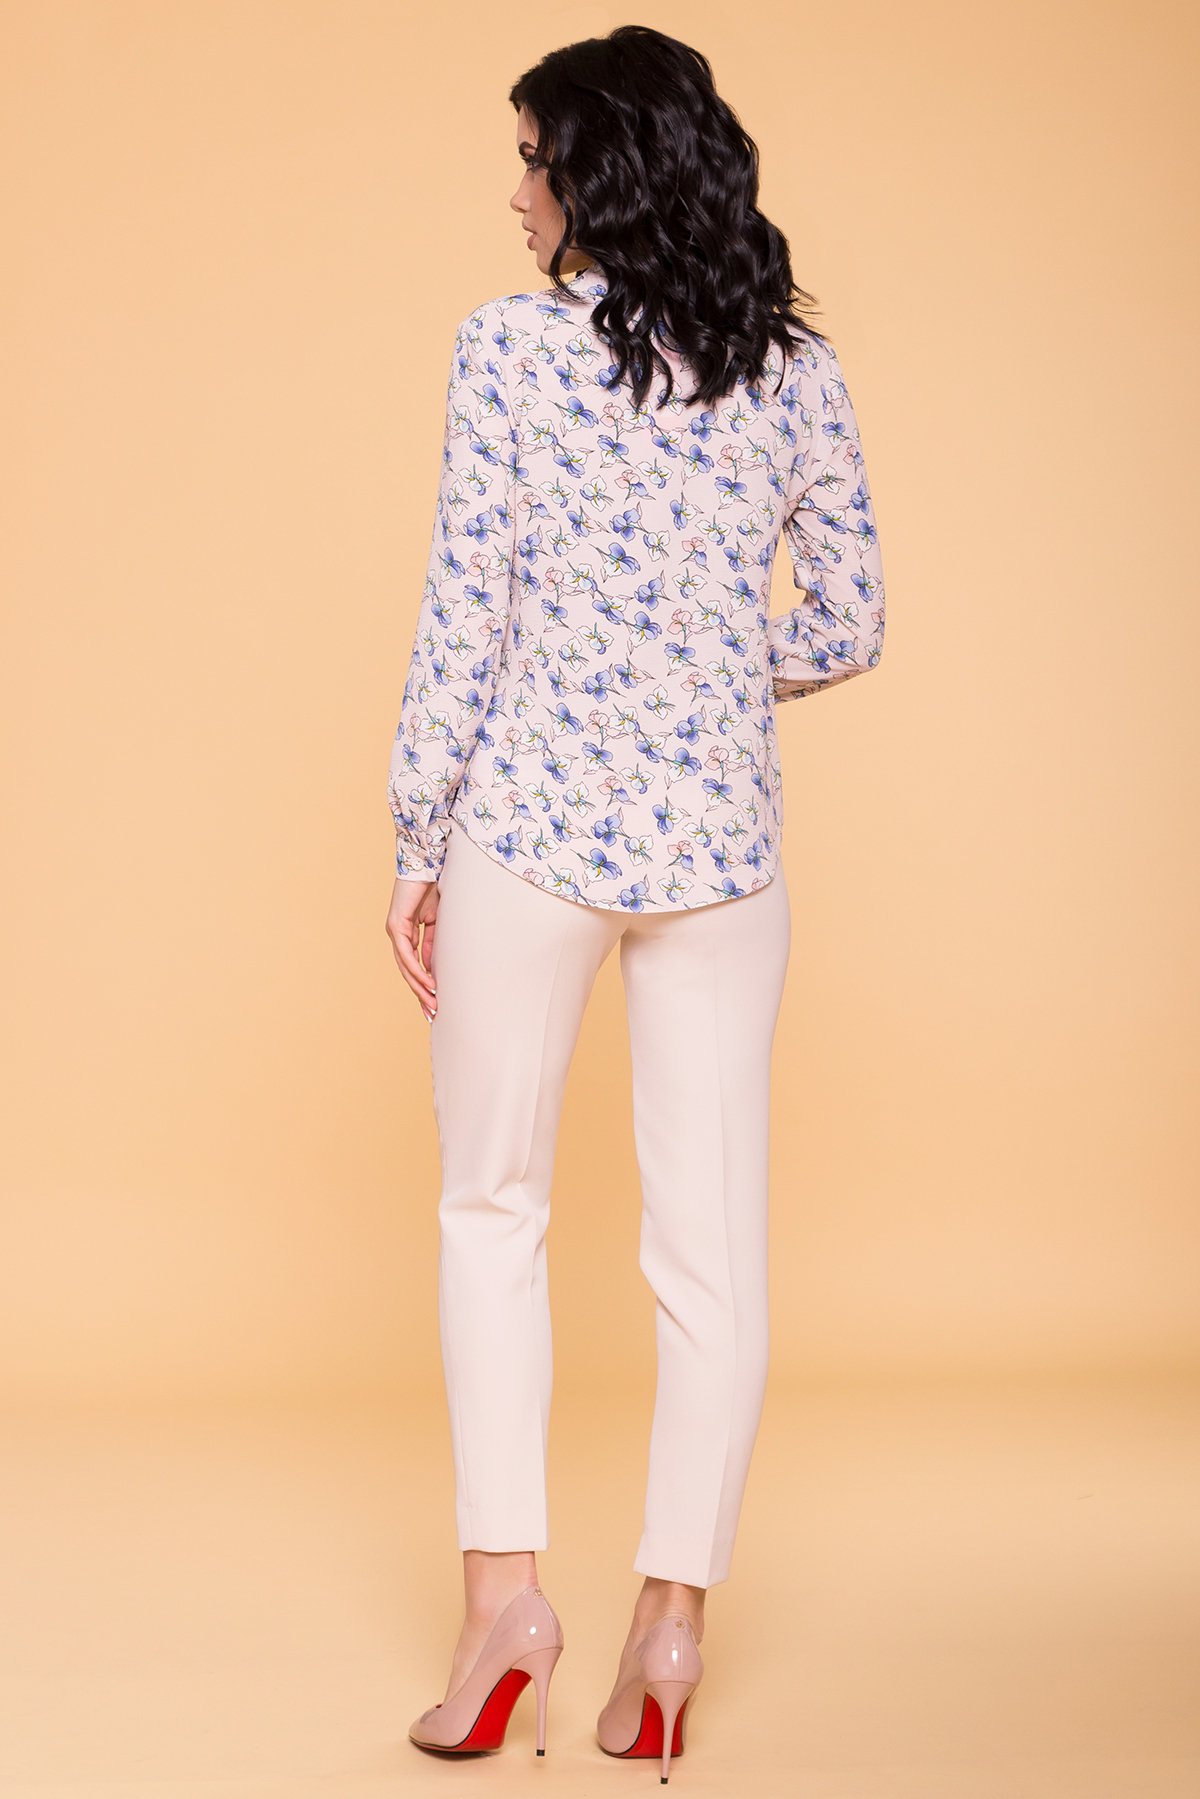 Рубашка Арсела 6790 АРТ. 41874 Цвет: Пудра/голубой ирис - фото 5, интернет магазин tm-modus.ru